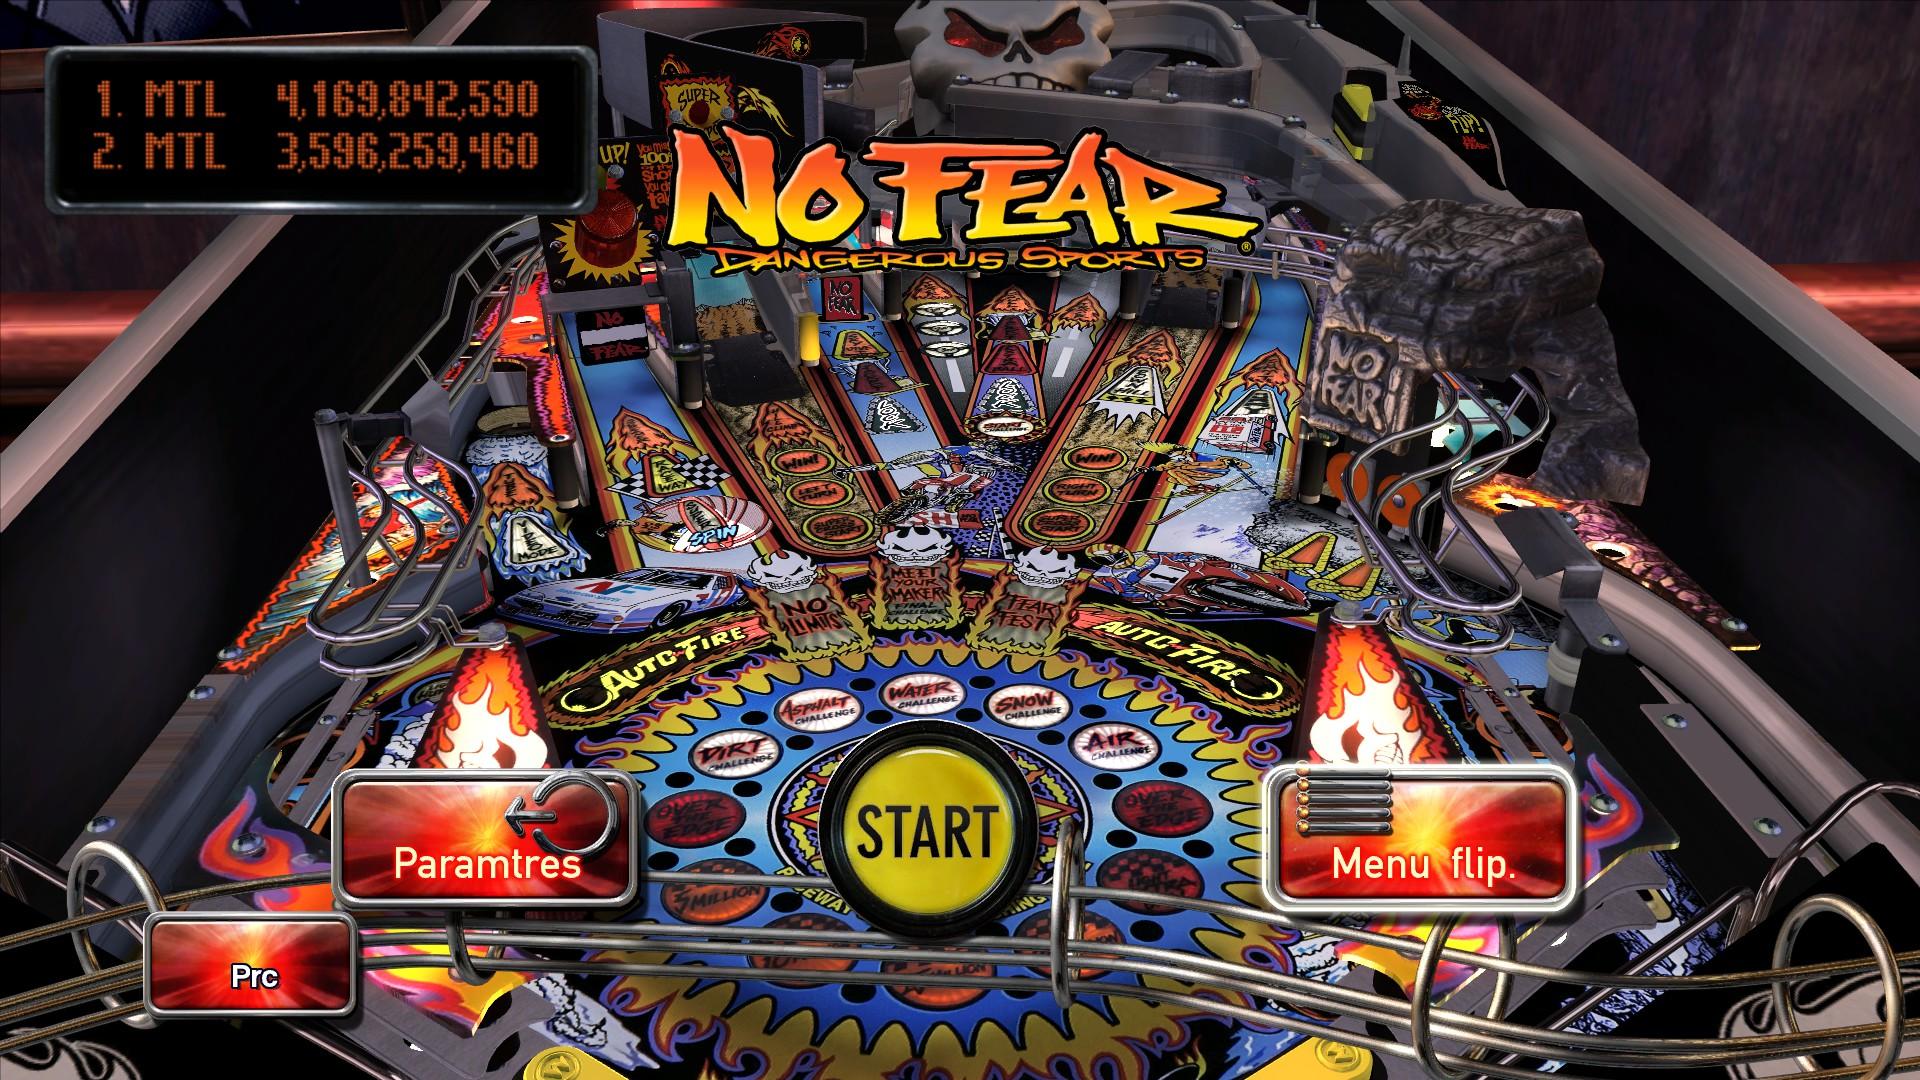 Mantalow: Pinball Arcade: No Fear: Dangerous Sports (PC) 4,169,842,590 points on 2015-12-06 23:34:43